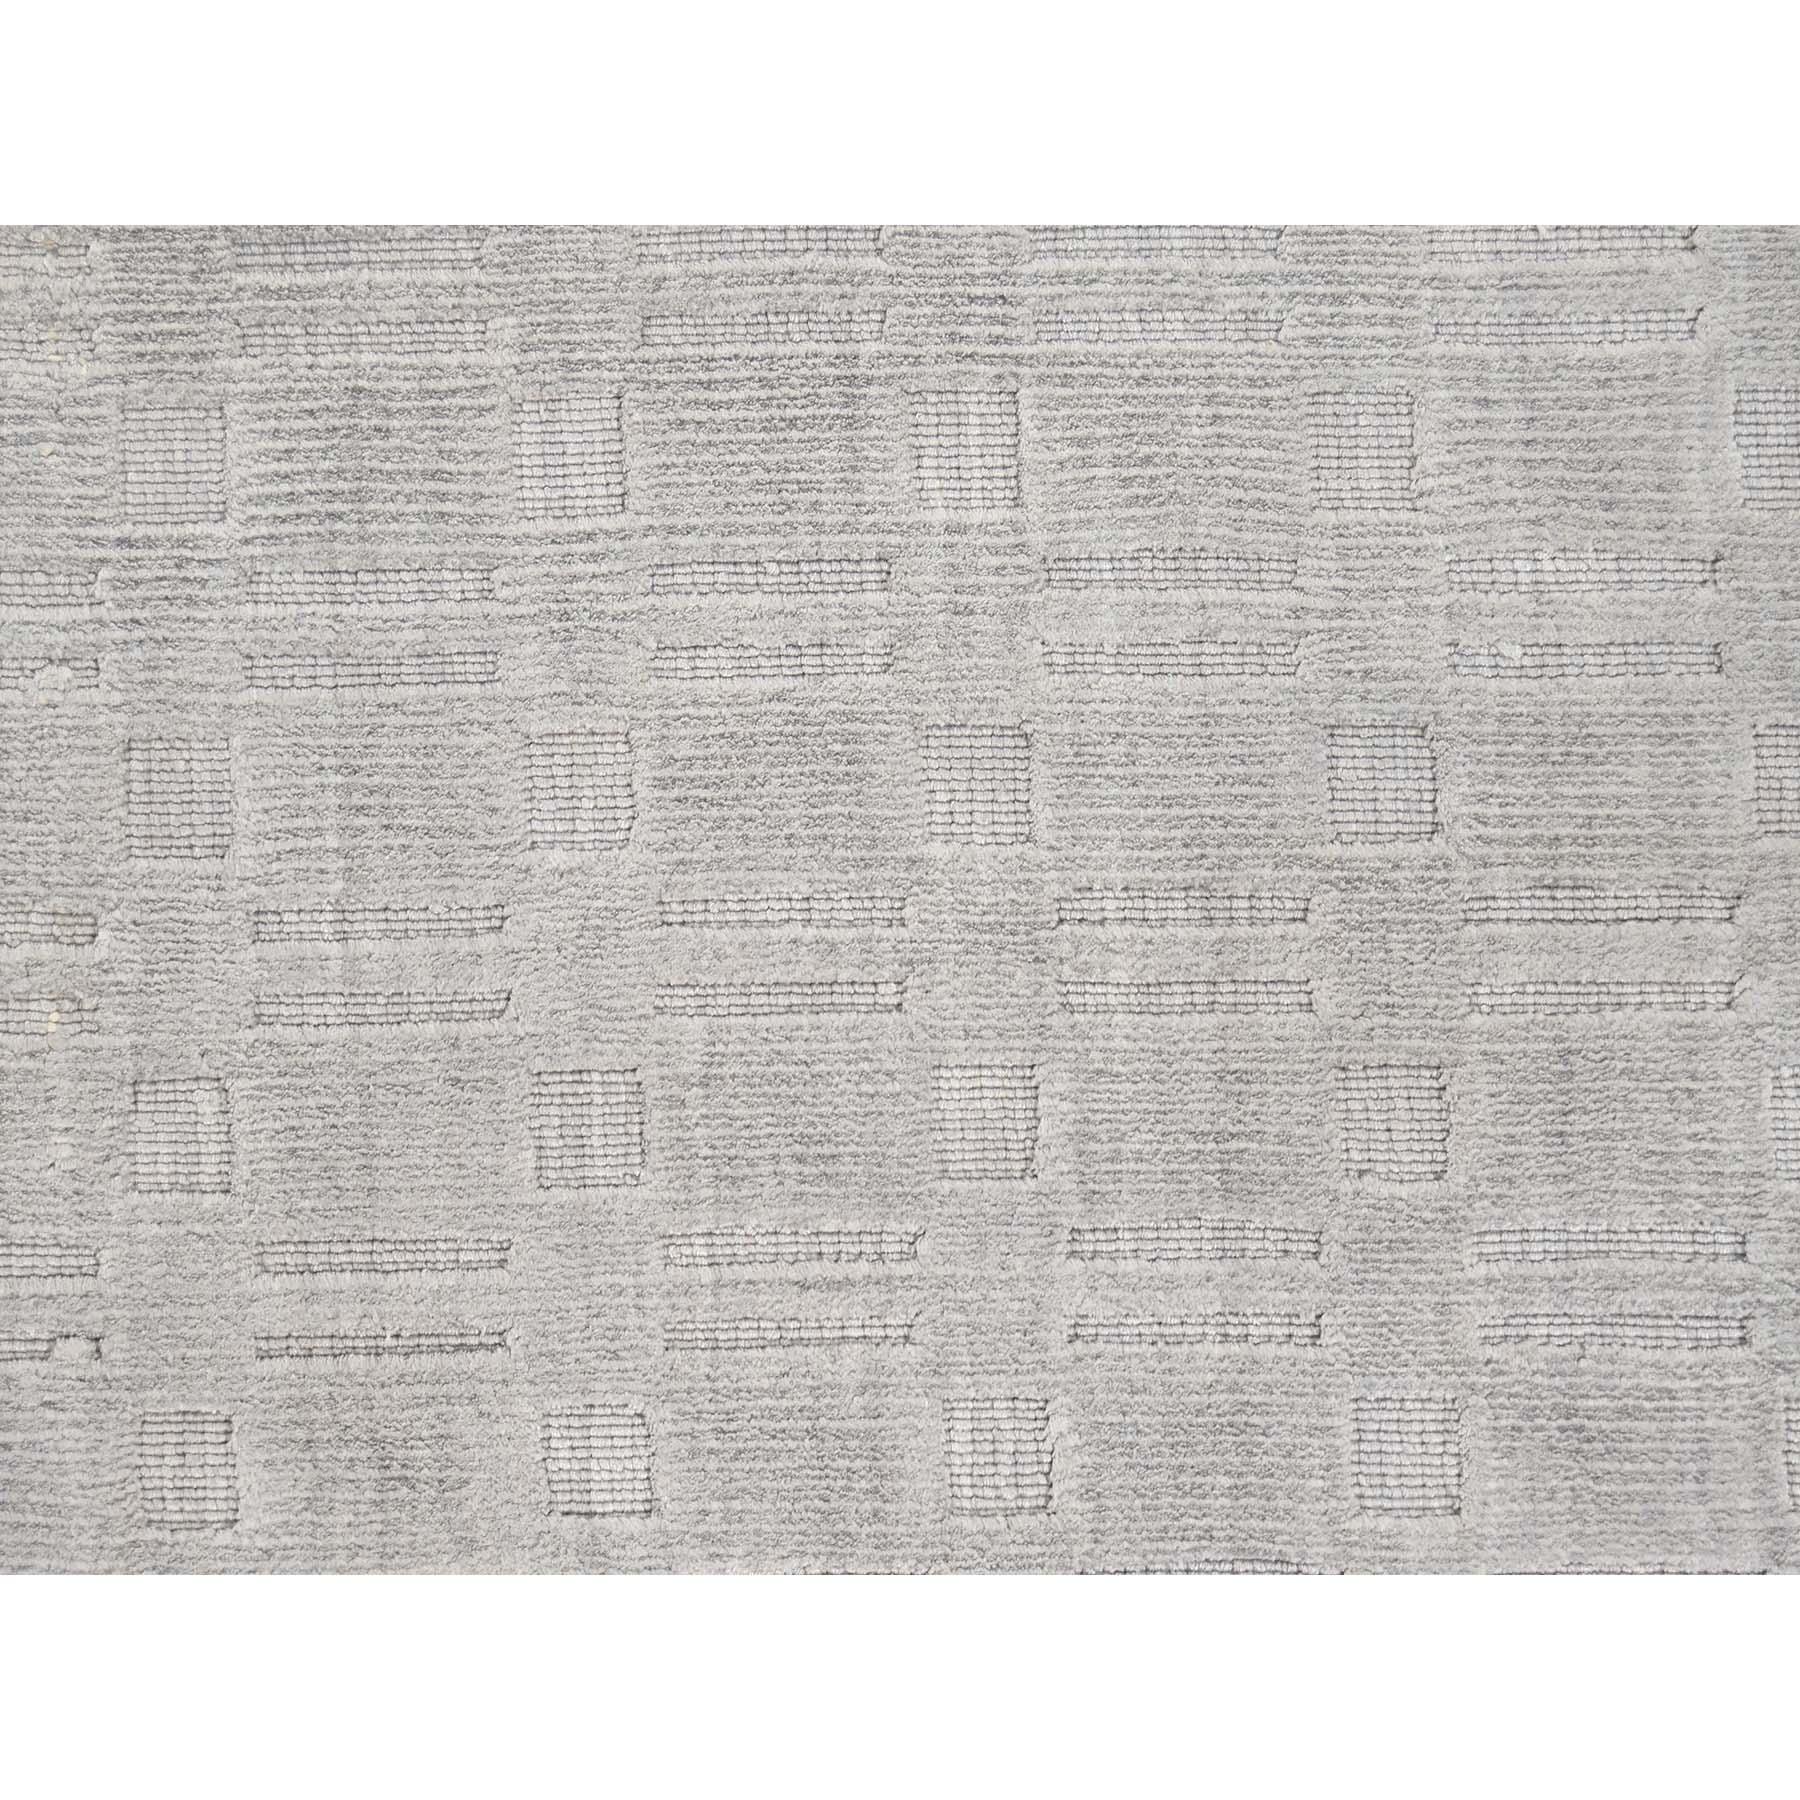 8-8 x11-8  Hand-Loomed Art Silk Tone on Tone Oriental Rug